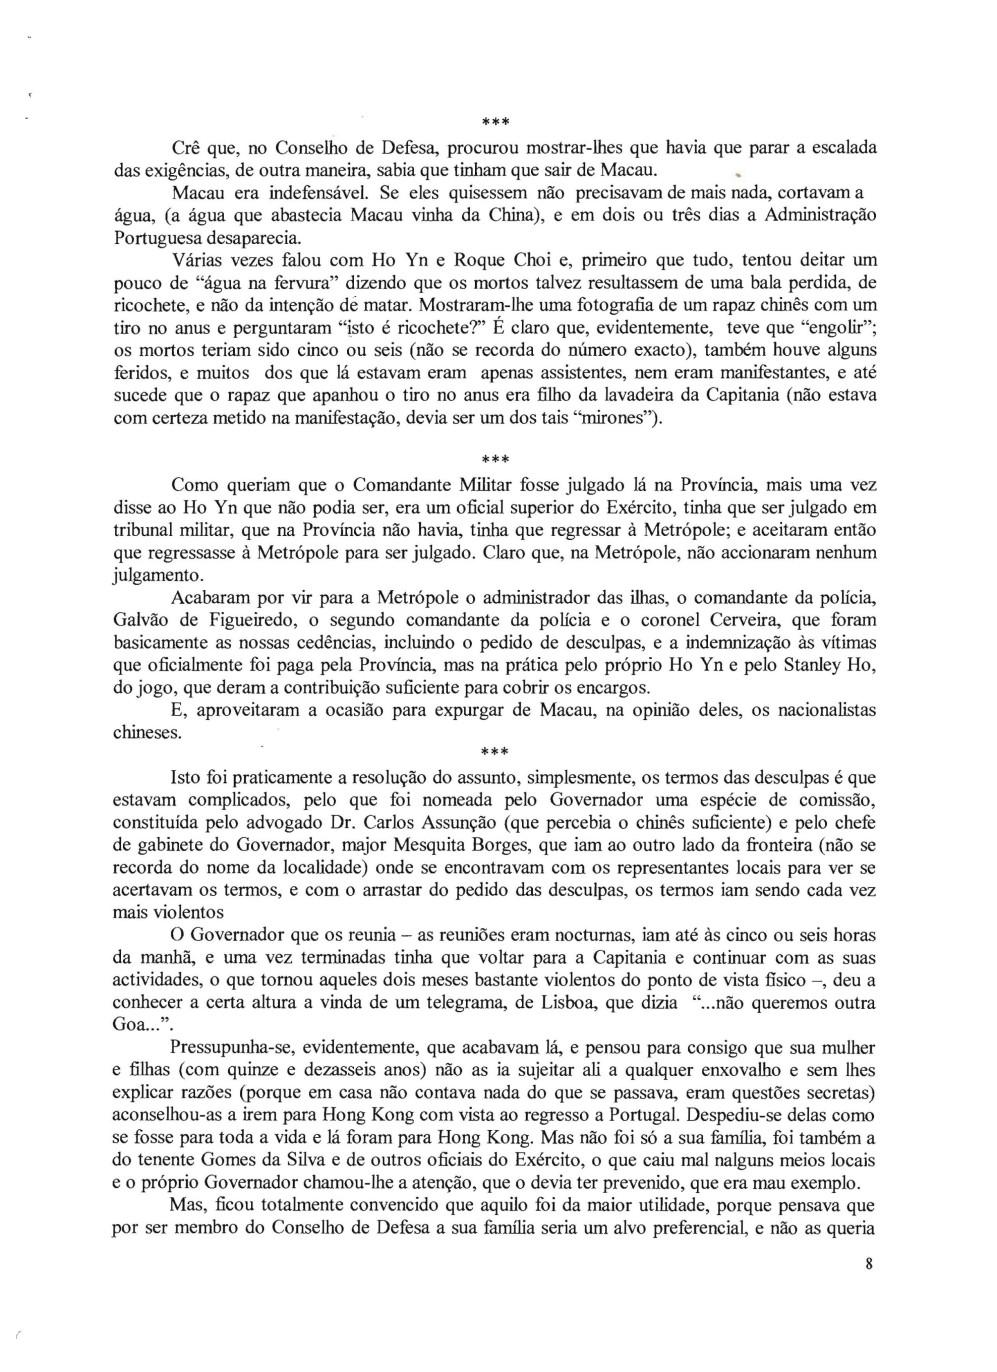 00473 01-03-28 Academia de Marinha-Entrevista do Alm Nunes da Silva pg 8 de 12